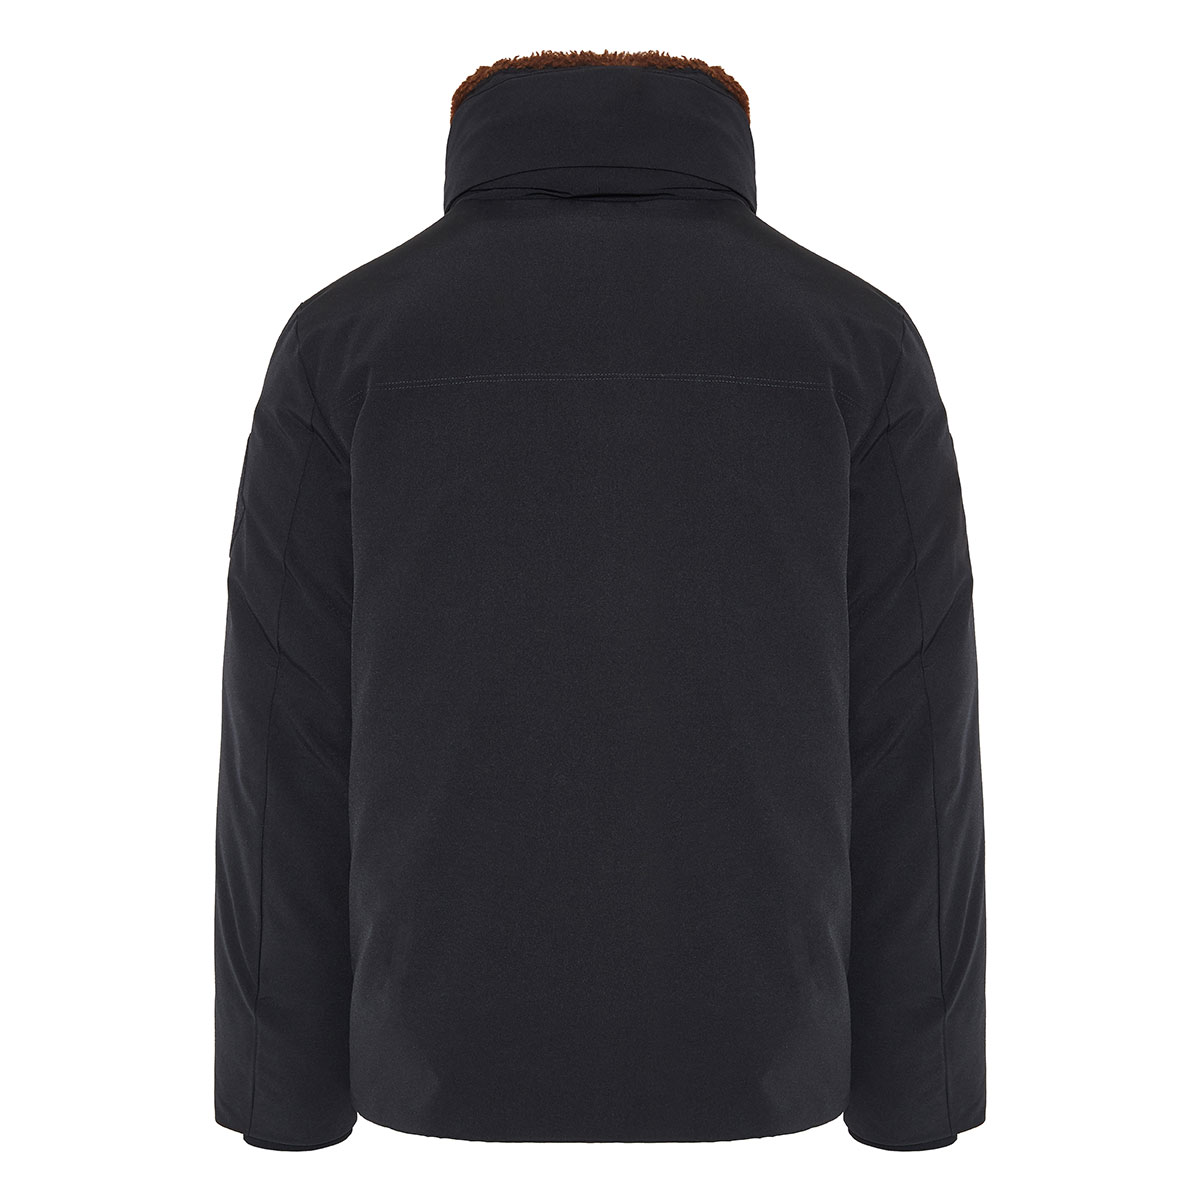 2 MONCLER 1952+VALEXTRA Sapin padded jacket